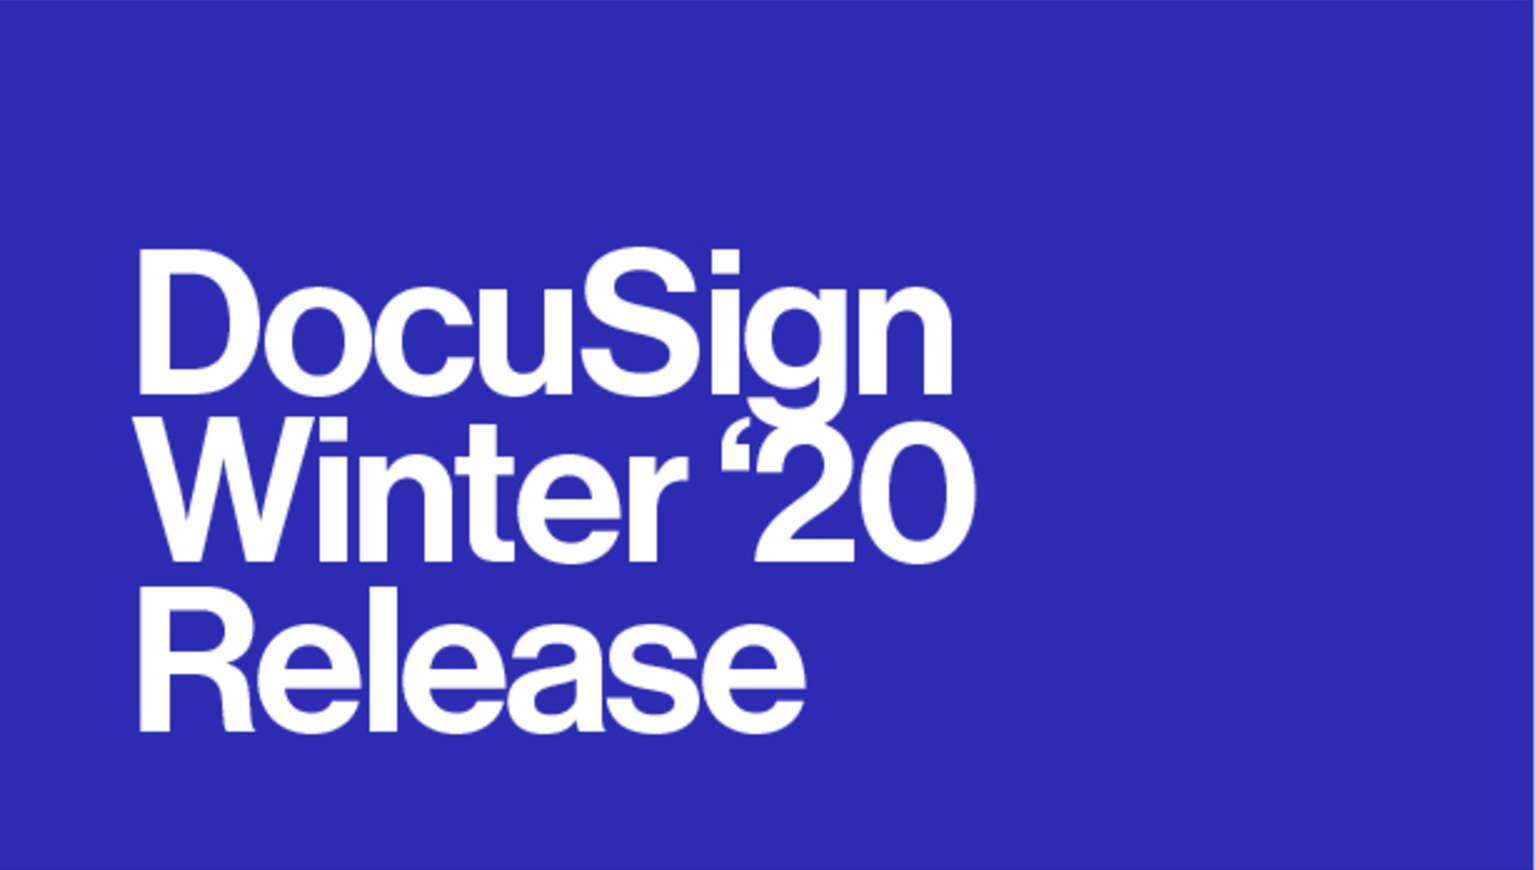 DocuSign Winter '20 Release